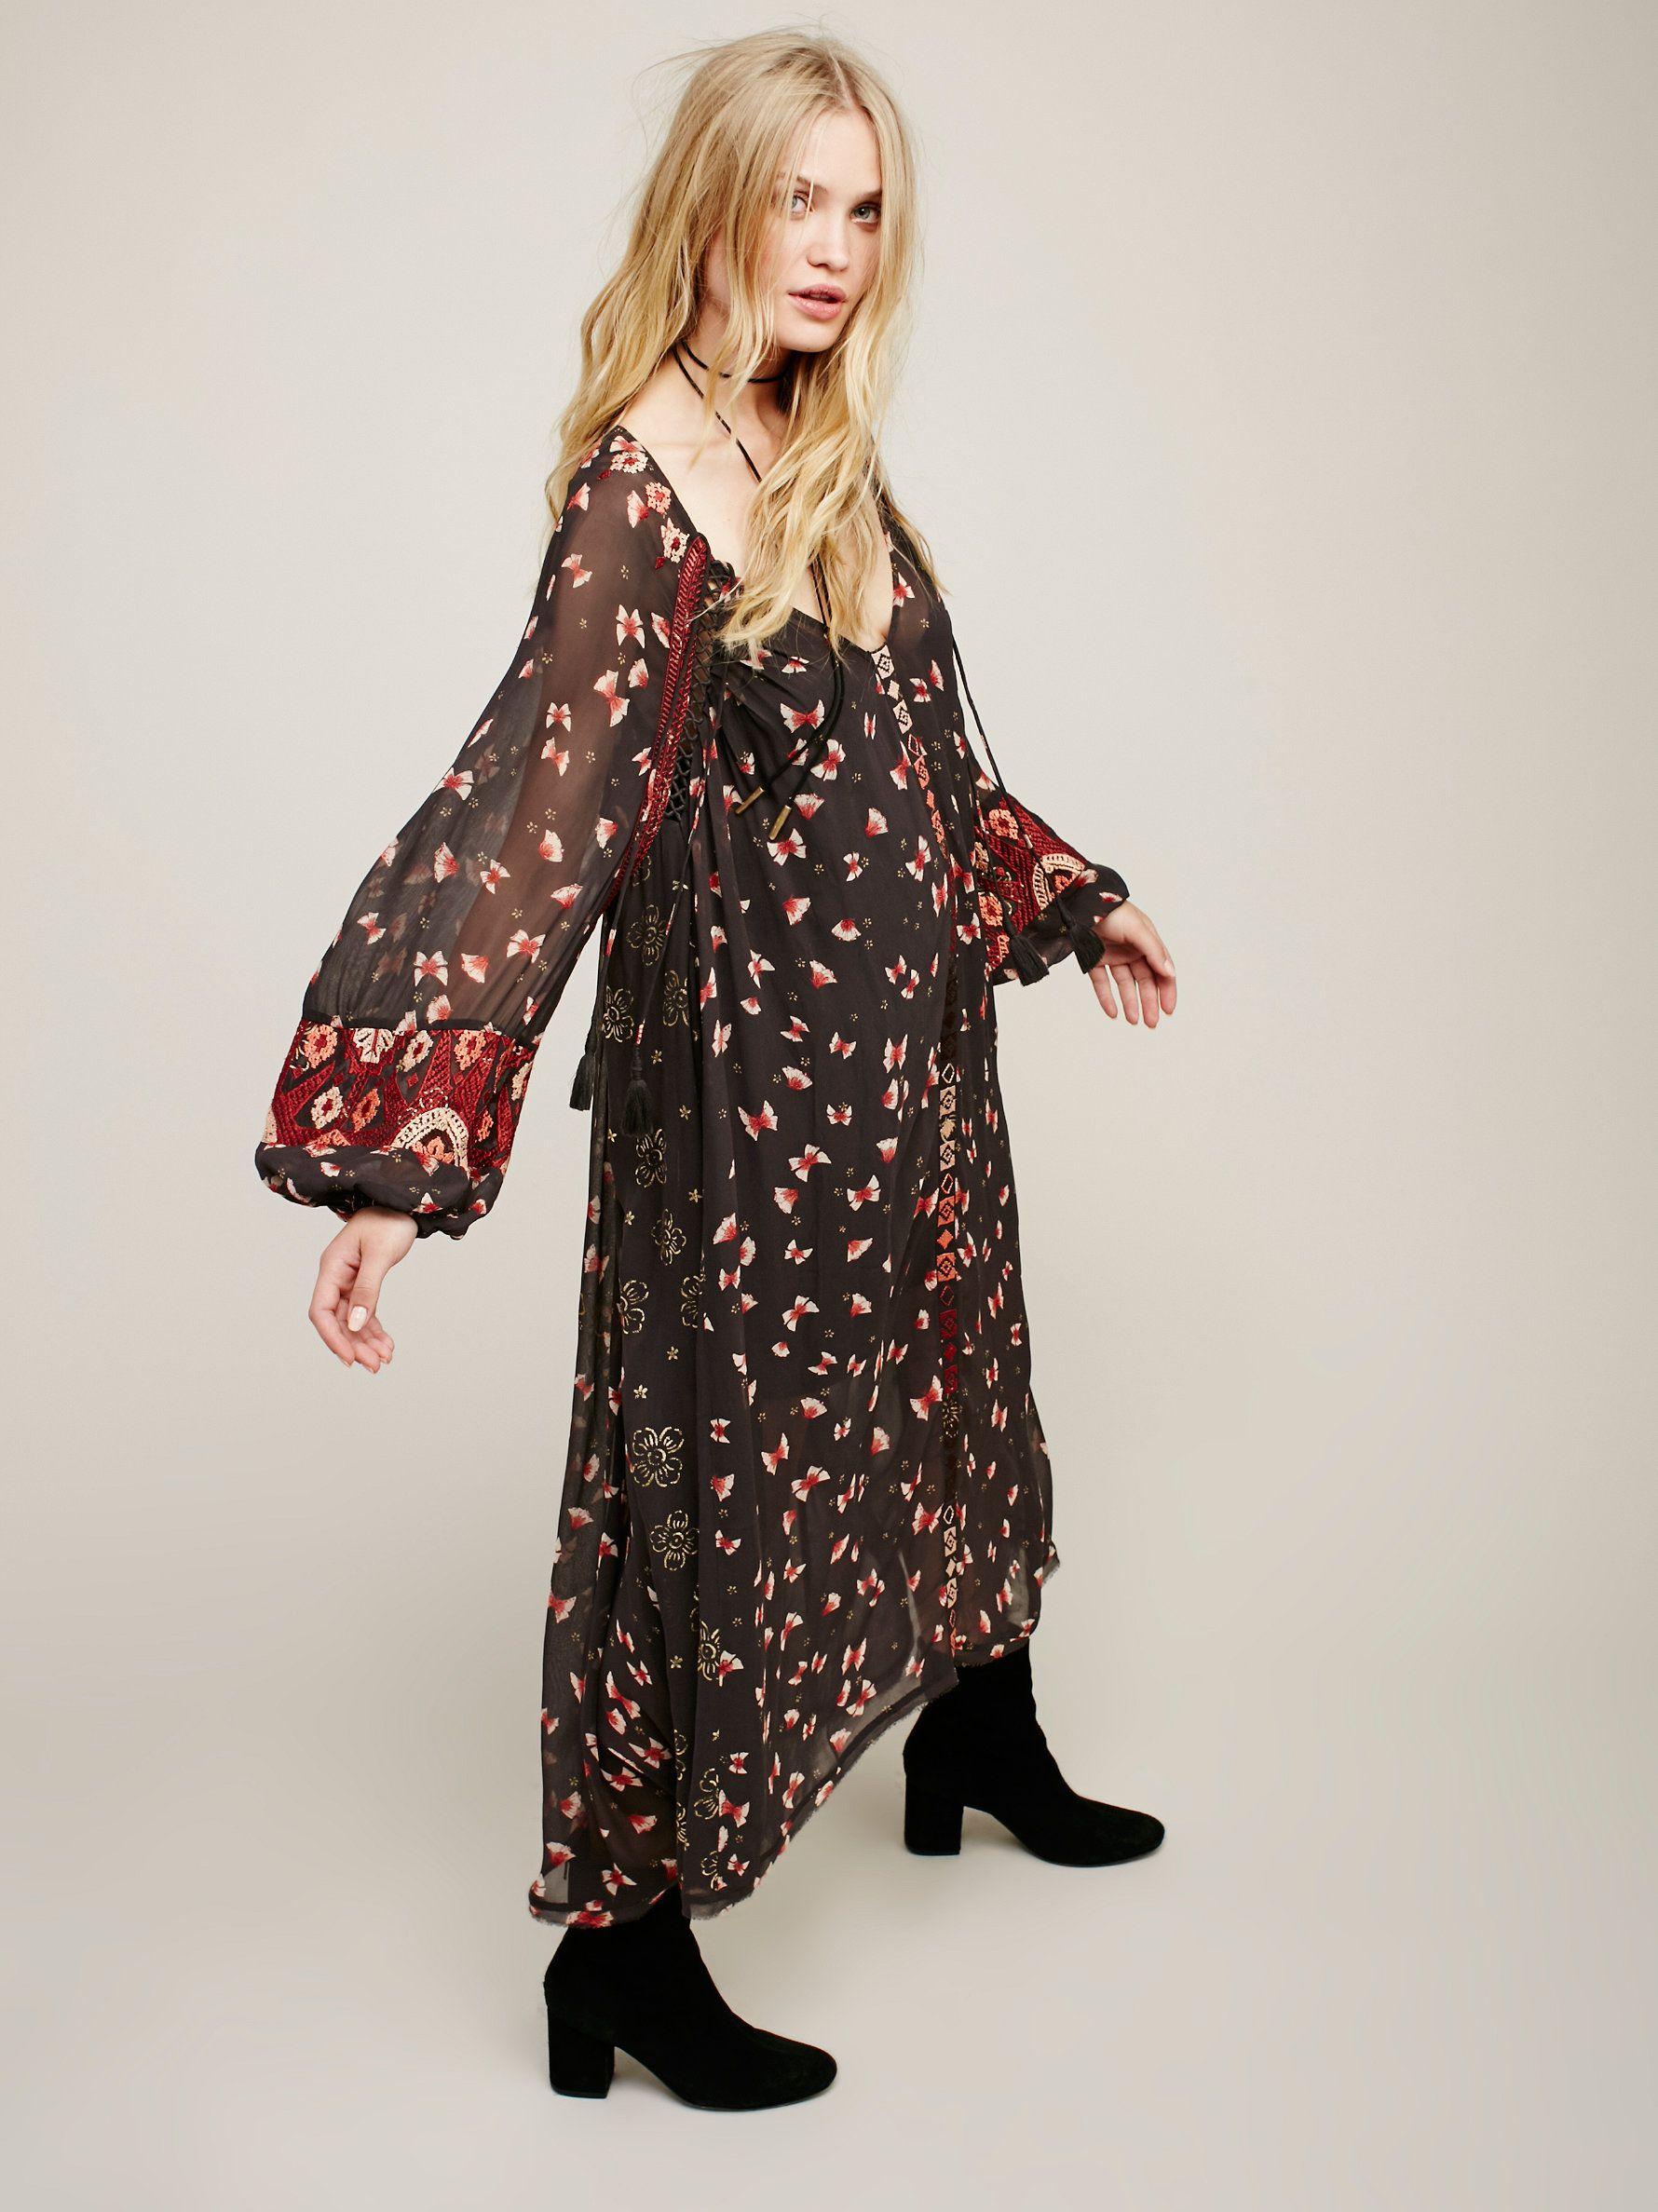 Viceroy printed maxi gorgeous long sleeve sheer maxi dress